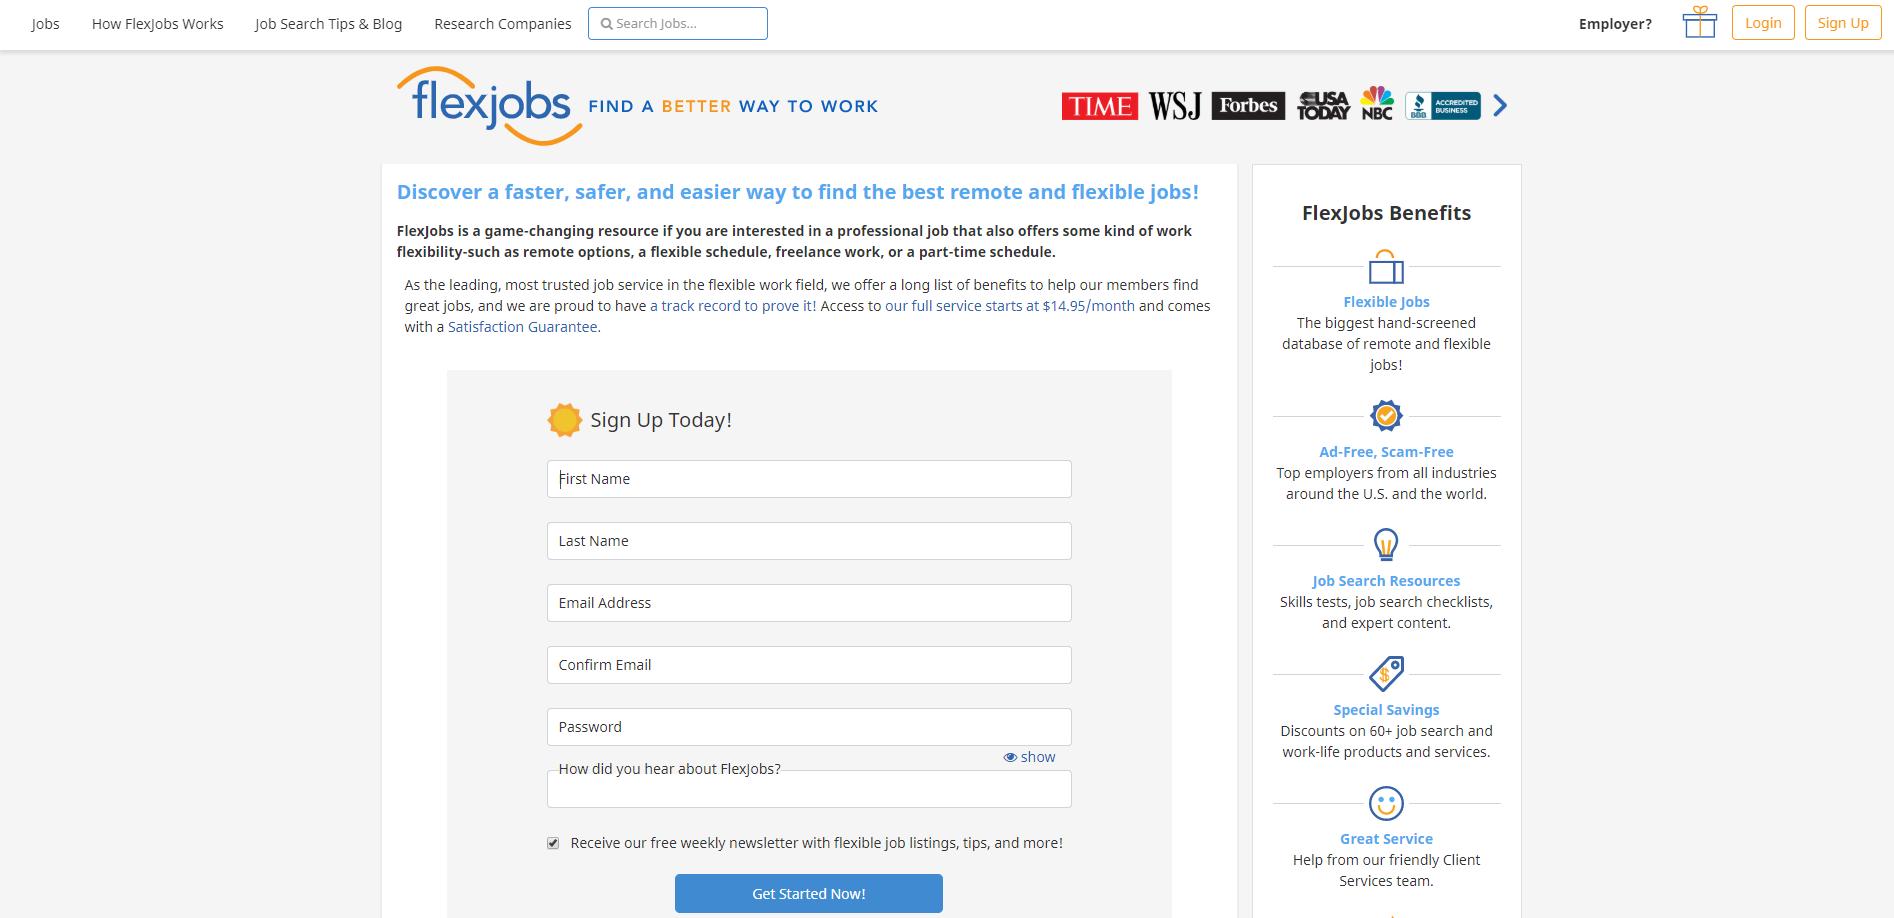 FlexJobs sign up